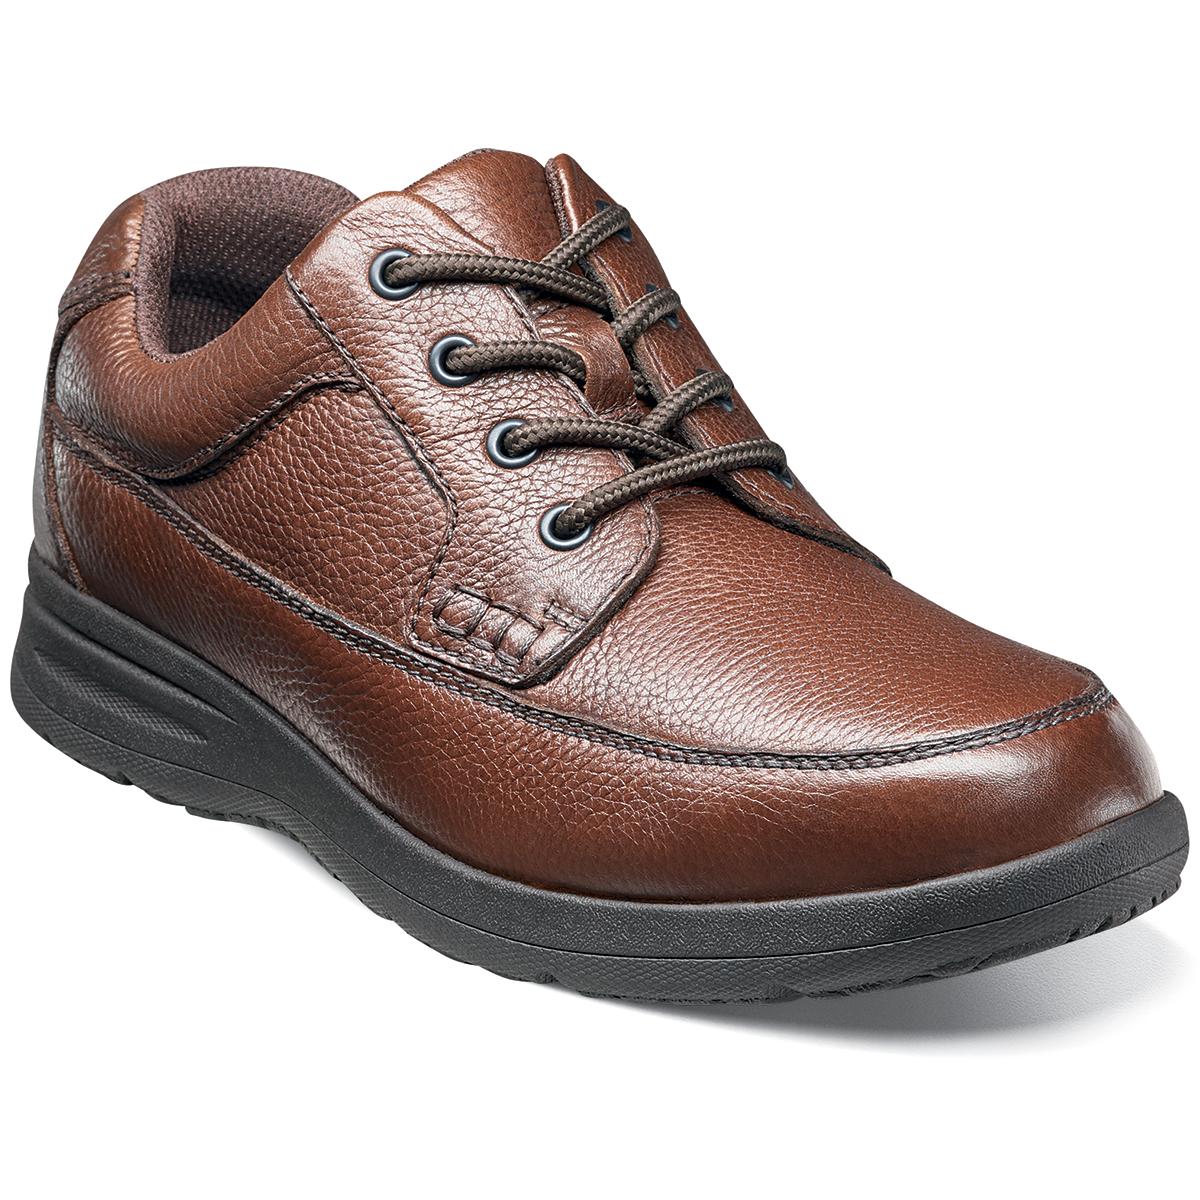 Nunn Bush Men's Cam Moc Toe Oxford Shoes, Extra Wide - Brown, 10